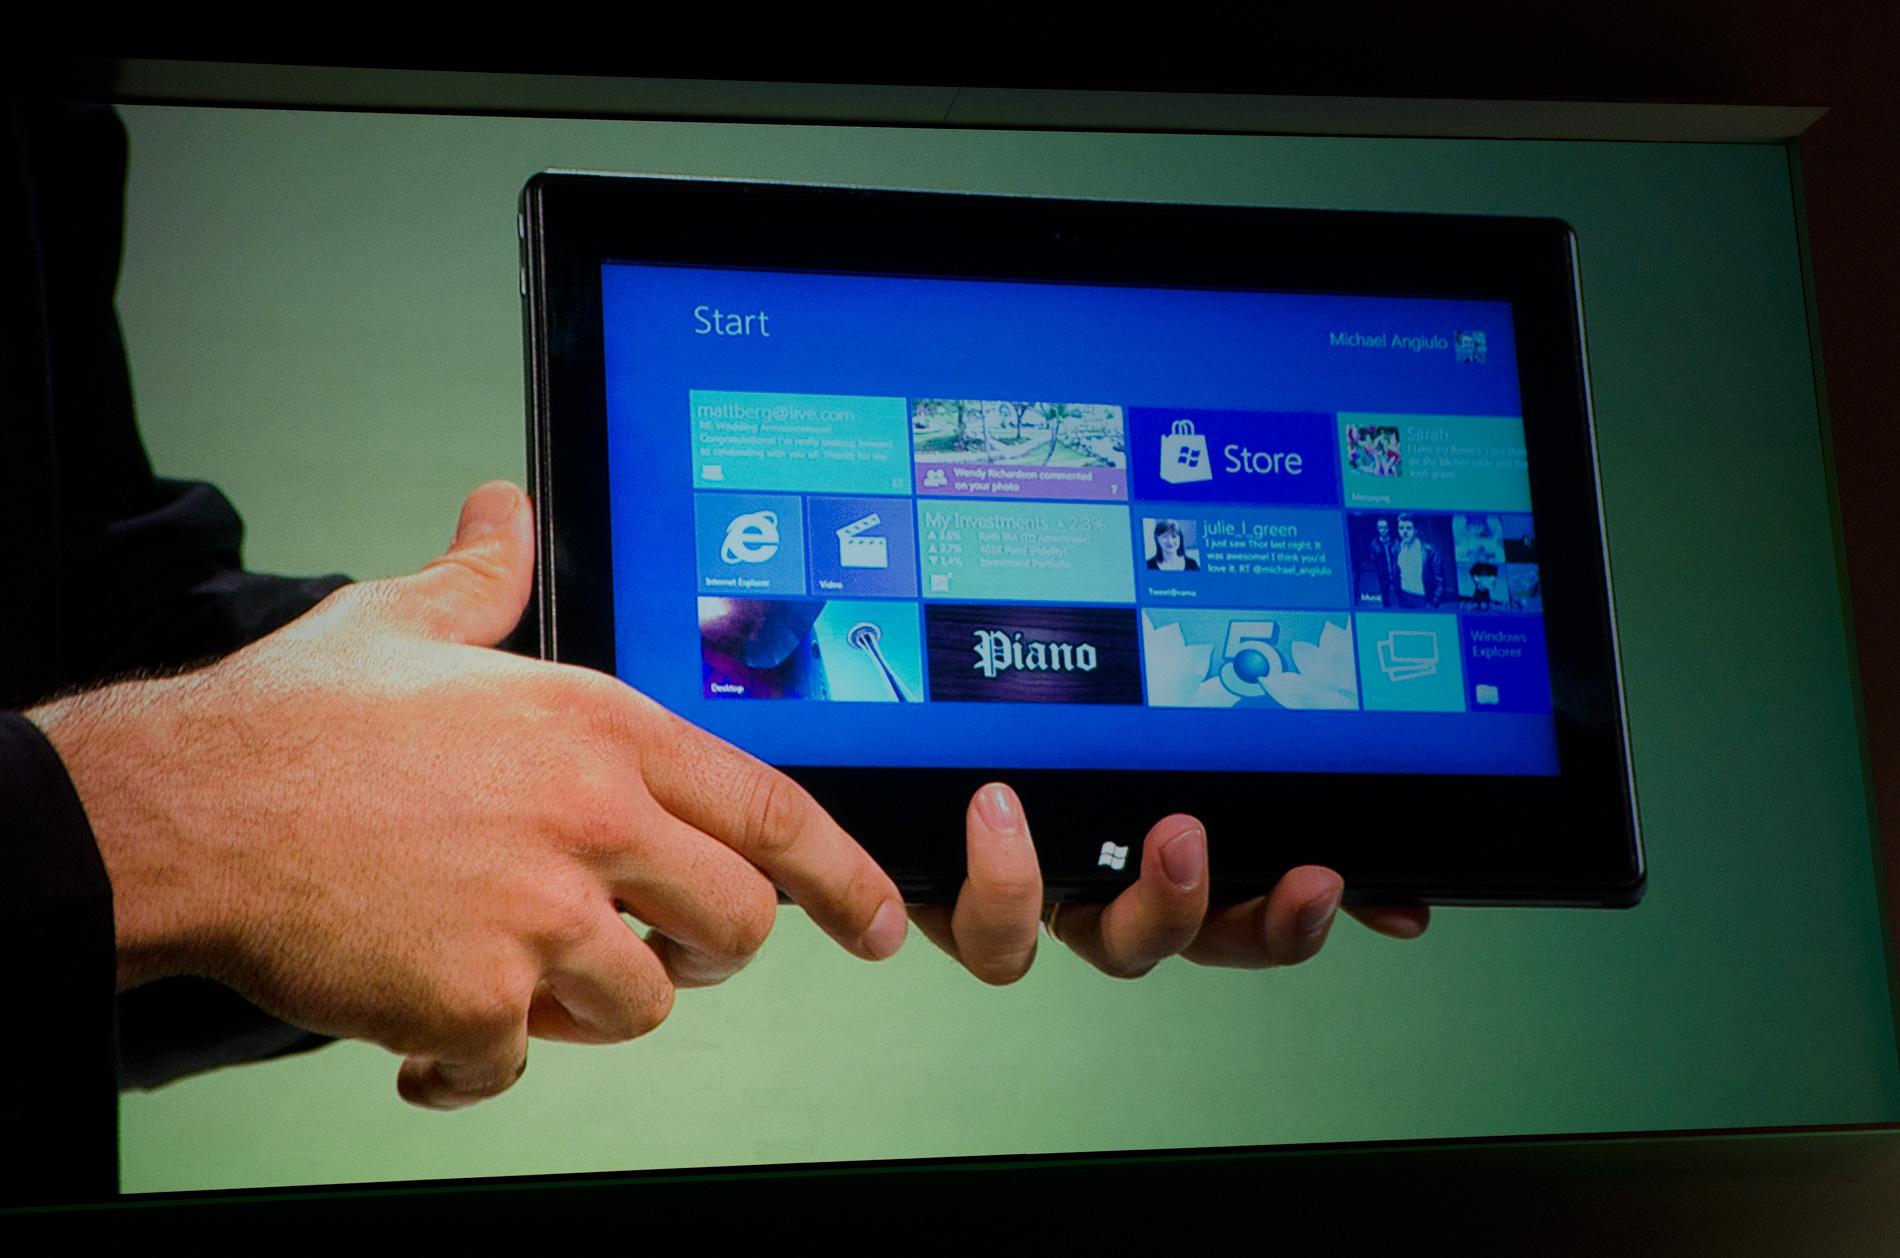 Windows 8 Running on ARM, NVIDIA Kal-El Notebook Demoed